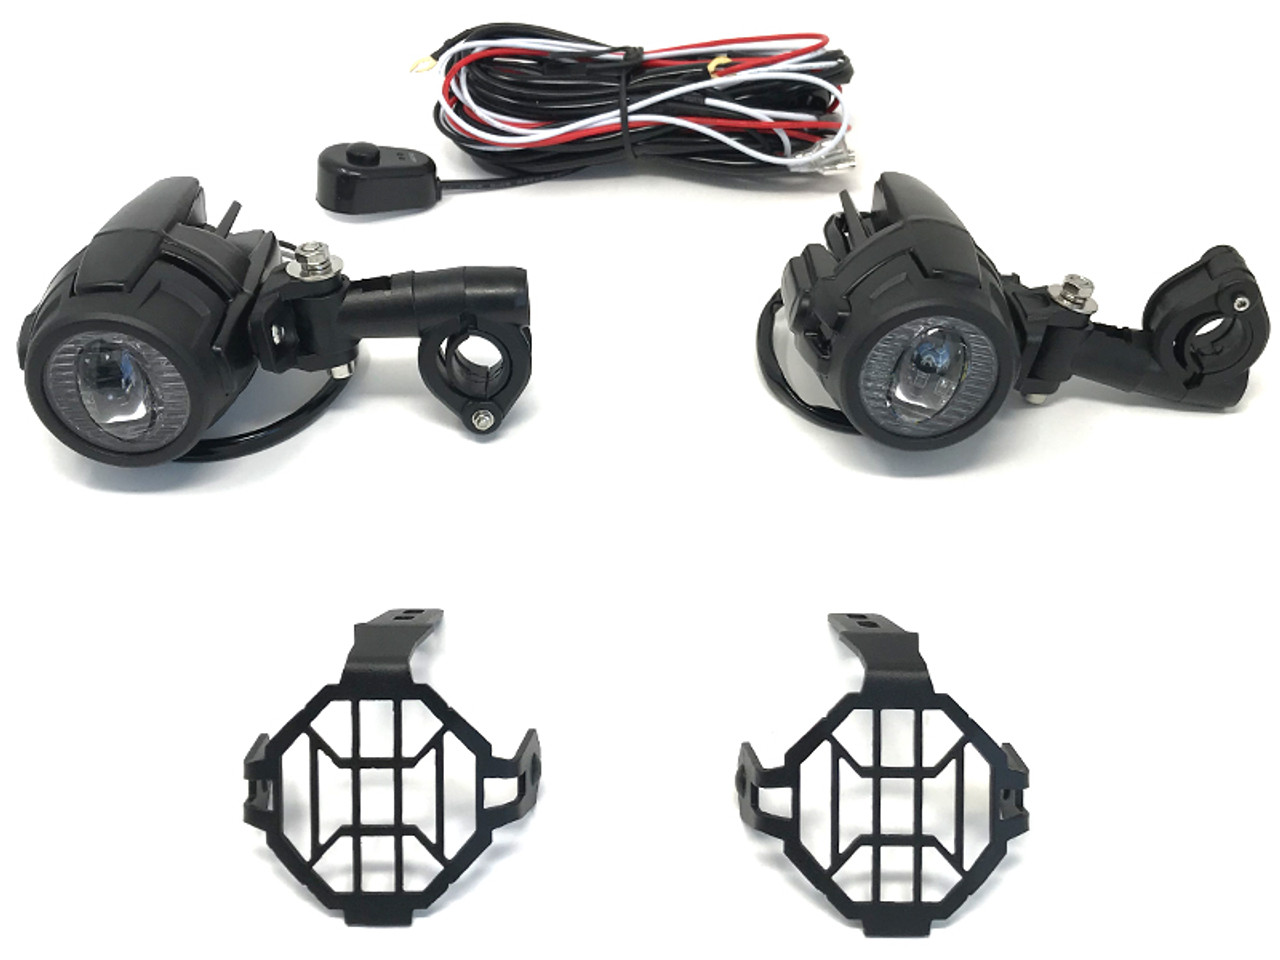 30w motorbike spotlights with wiring switch kit for adventure bike 30w motorbike spotlights with wiring switch kit for adventure bike quad trike asfbconference2016 Choice Image